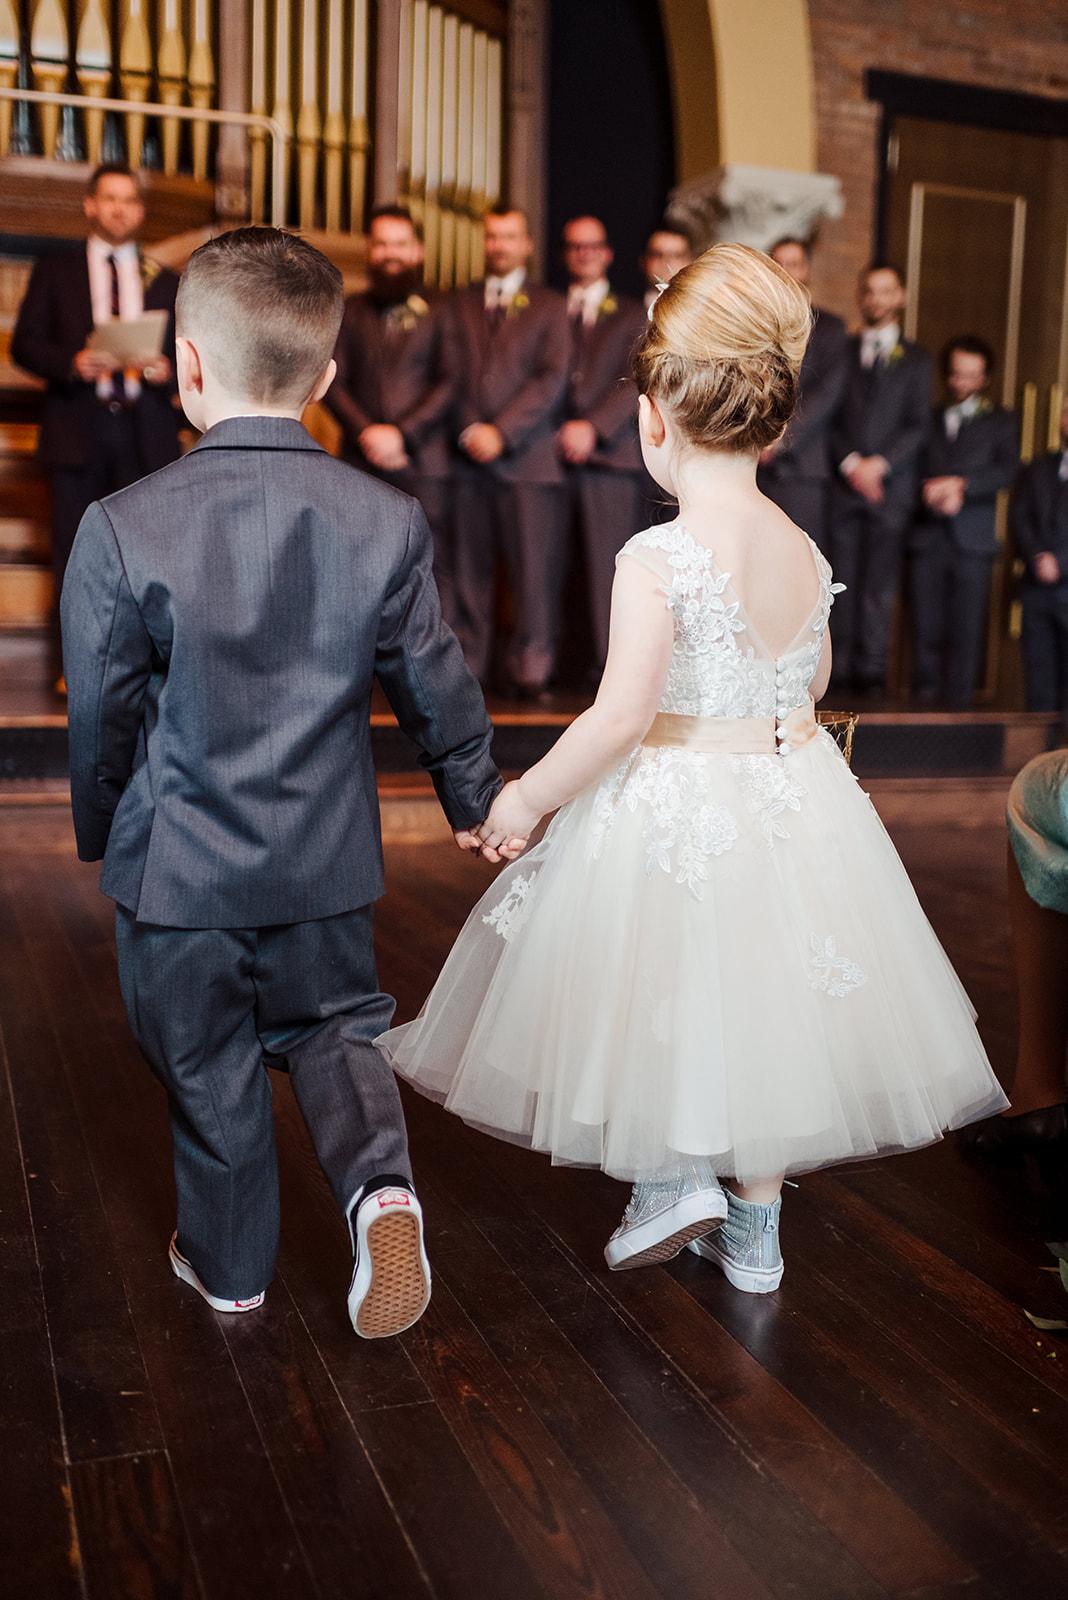 Flower girl and ring bearer: Nashville wedding at Clementine featured on Nashville Bride Guide